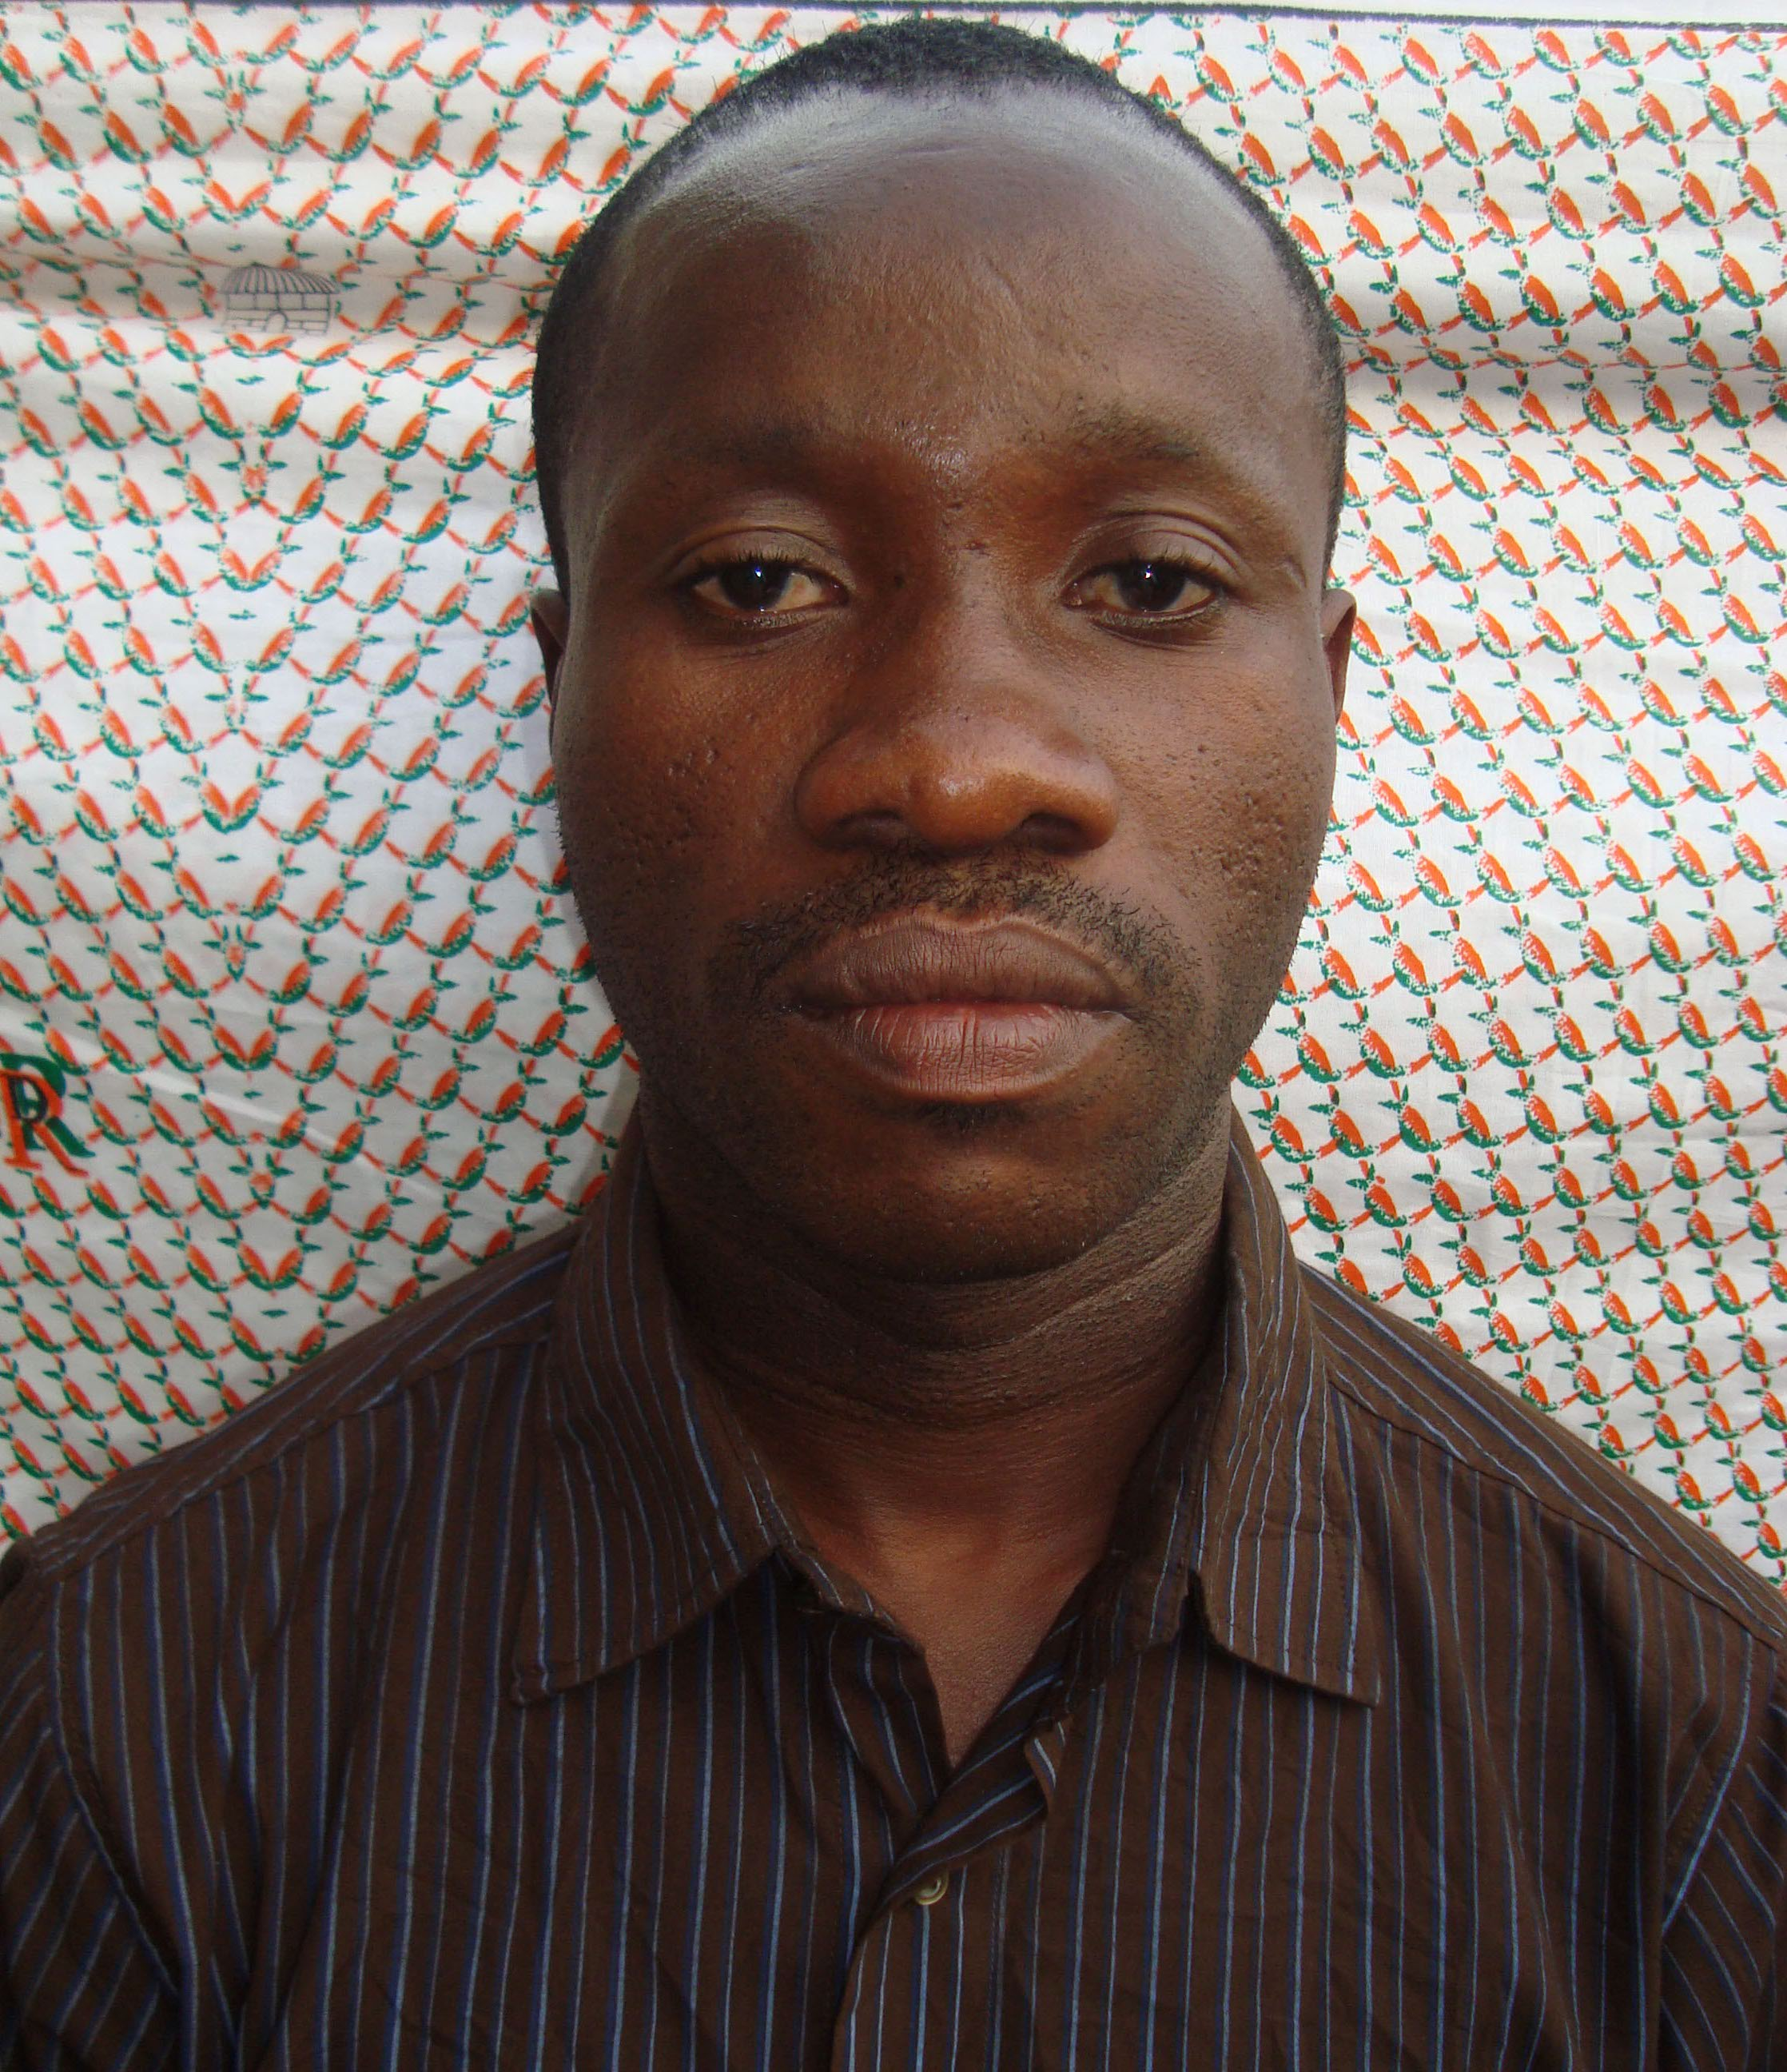 mbambalancinatrsoriergneral.jpg